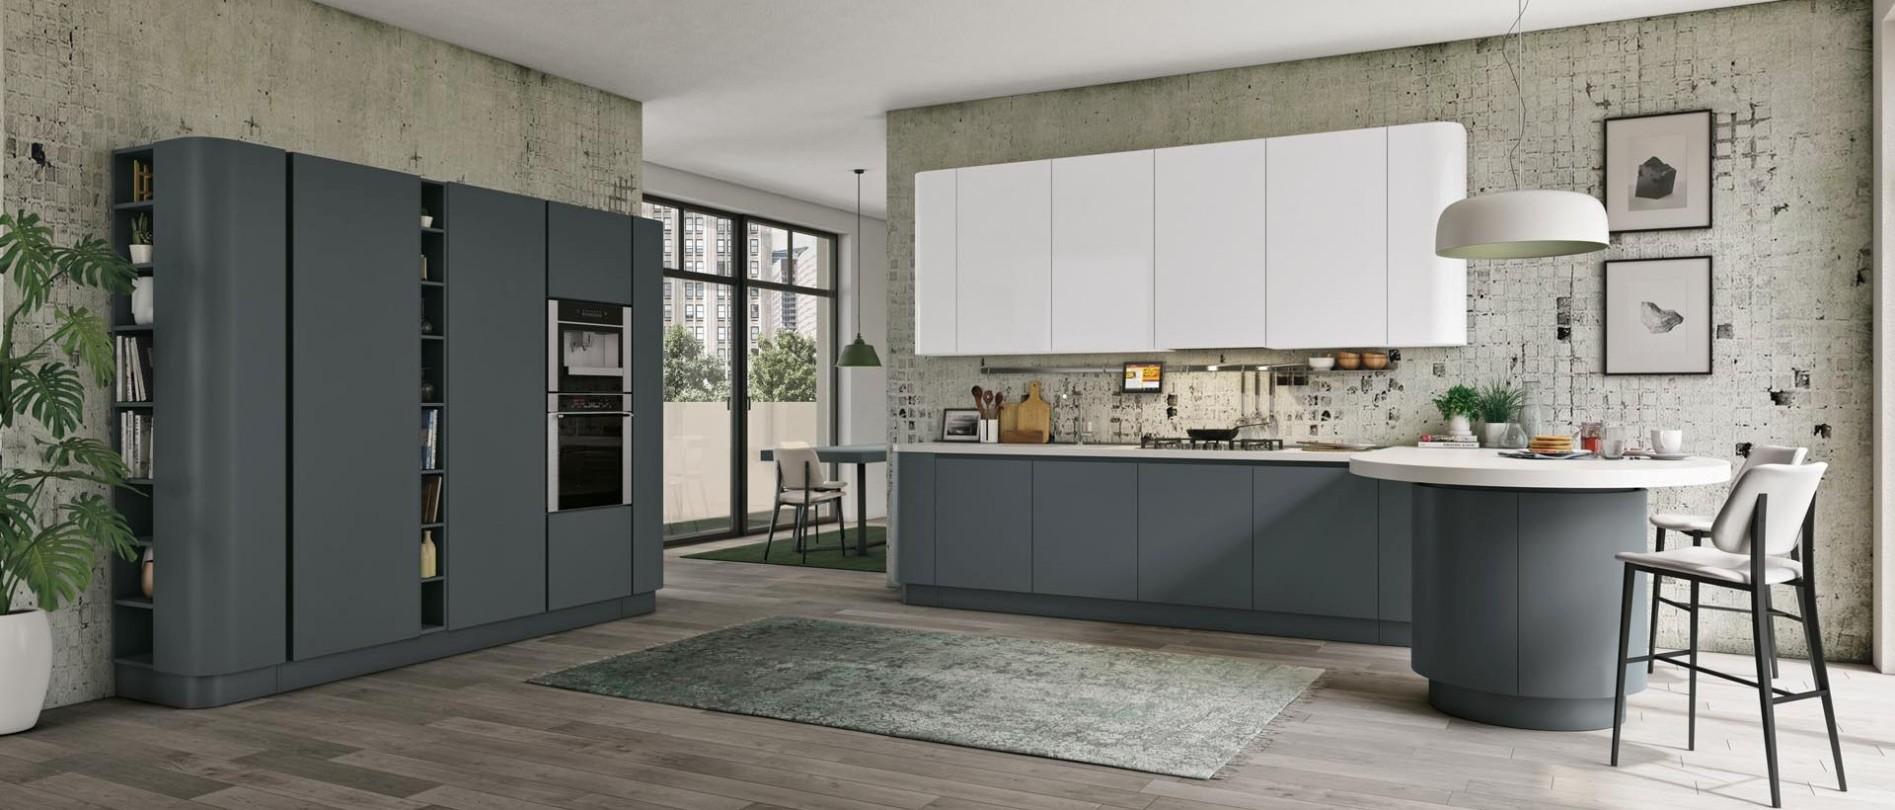 italienische m bel italienische m belhaus italienische stillm bel mobili italiani. Black Bedroom Furniture Sets. Home Design Ideas